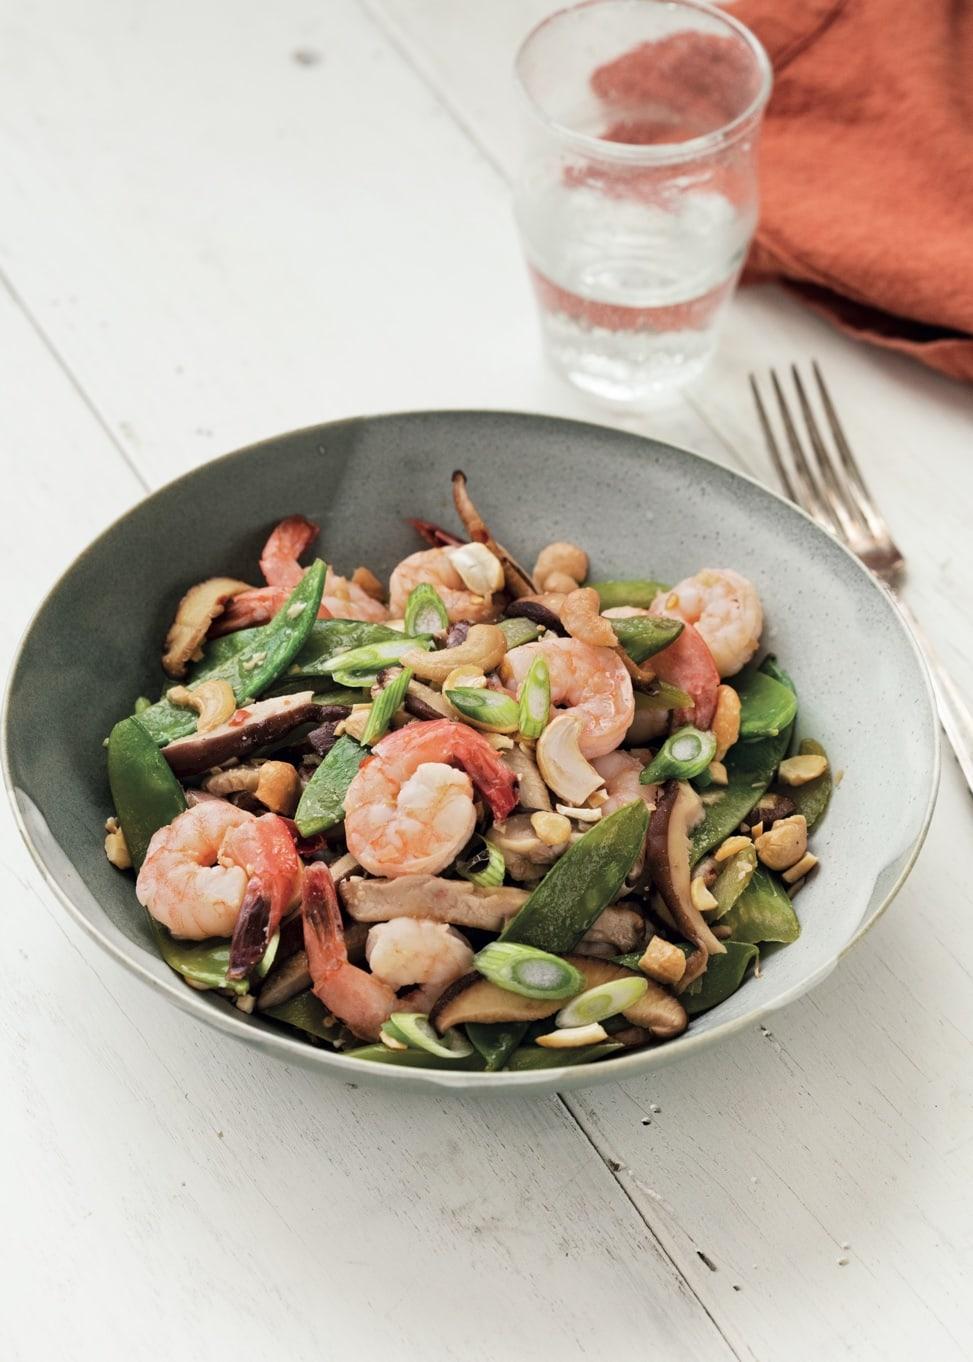 Whole30 Shrimp Stir-Fry Recipe | Against All Grain - Delectable paleo ...